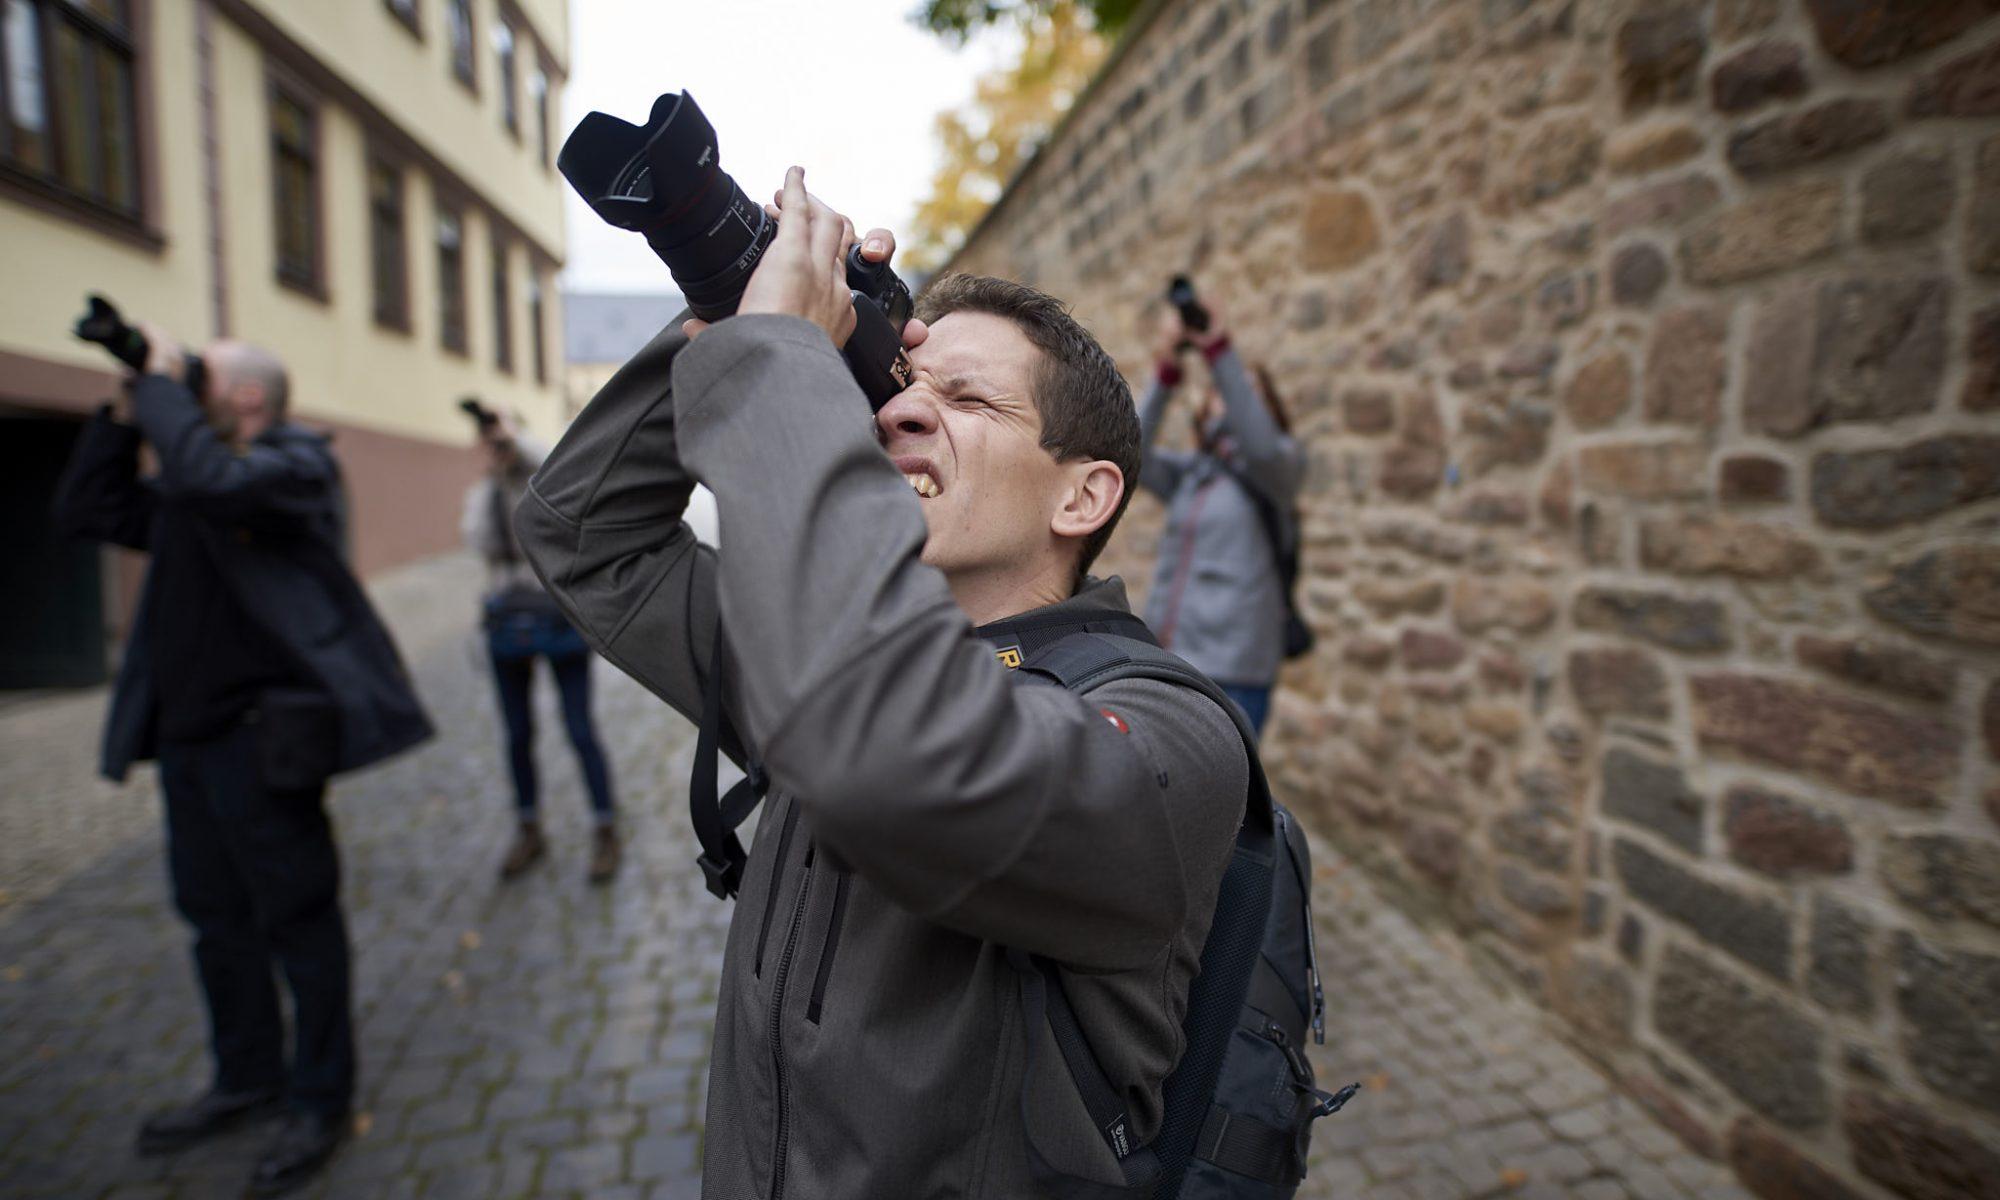 Fotowalk in Fulda